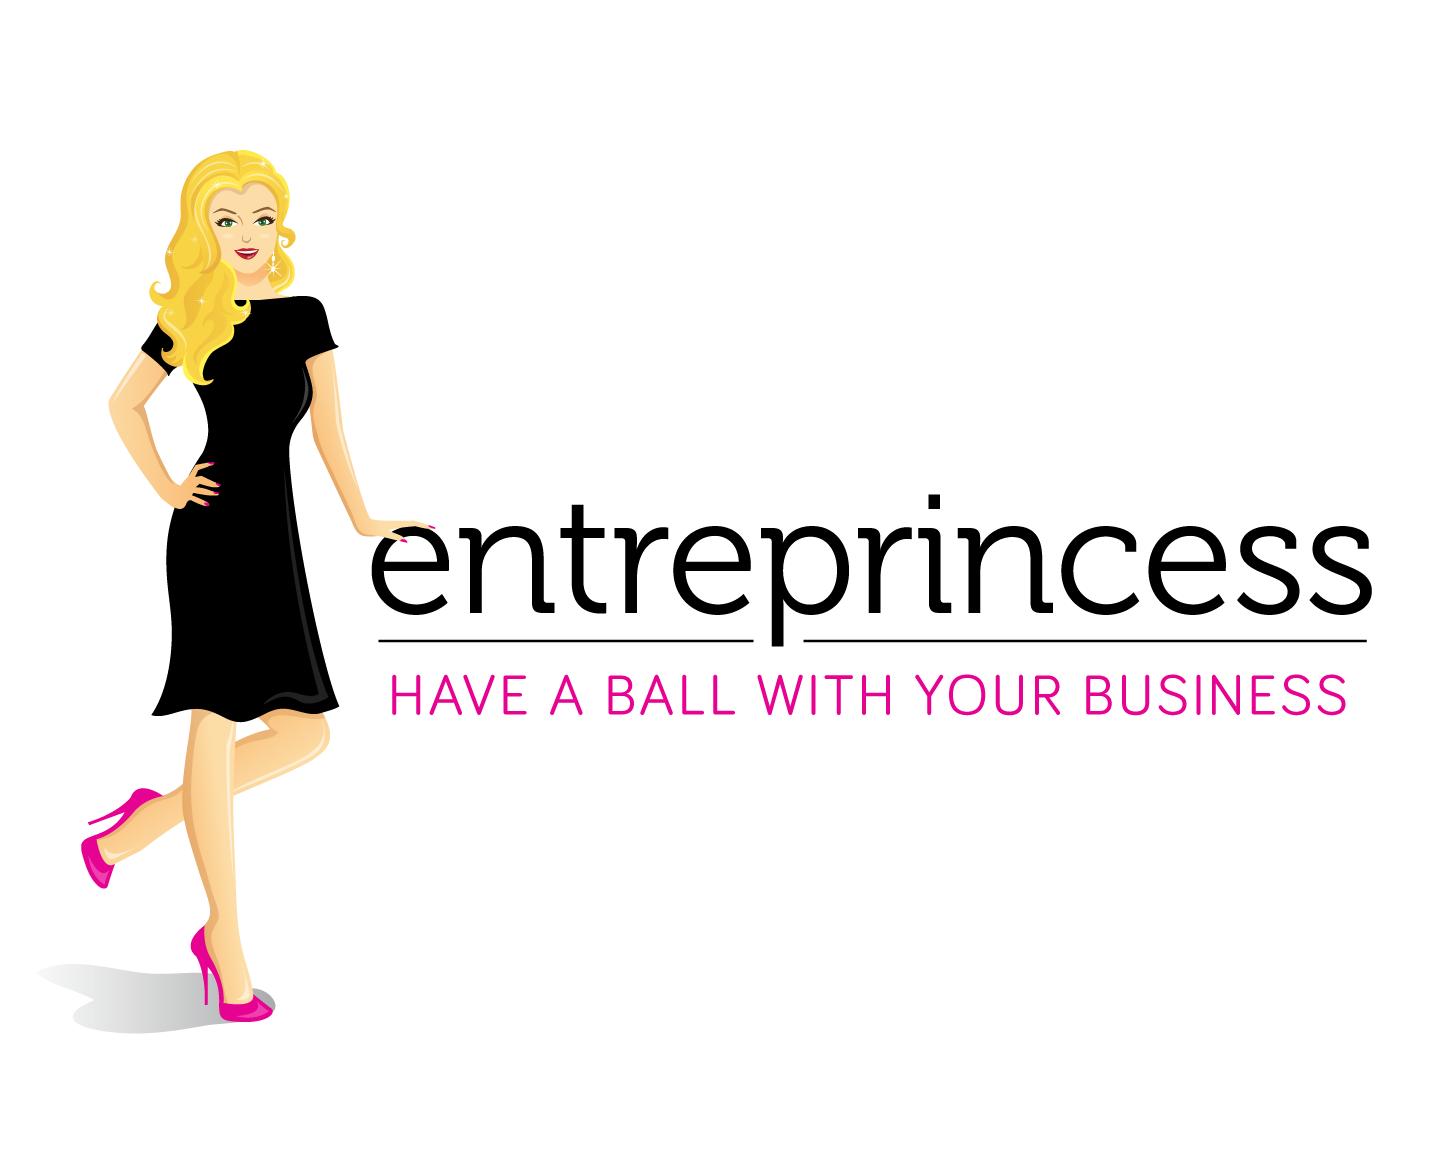 Design a stylish female entrepreneur cartoon illustration for the launch of the Entreprincess brand!